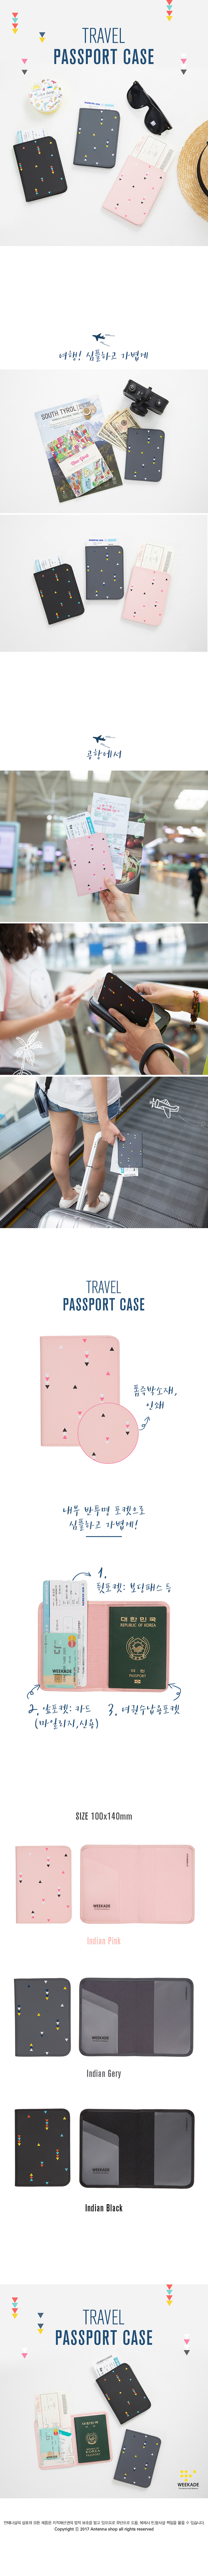 TRAVEL PASSPORT CASE11,000원-안테나샵여행/레포츠, 여권/네임택, 여권케이스, 심플 케이스바보사랑TRAVEL PASSPORT CASE11,000원-안테나샵여행/레포츠, 여권/네임택, 여권케이스, 심플 케이스바보사랑